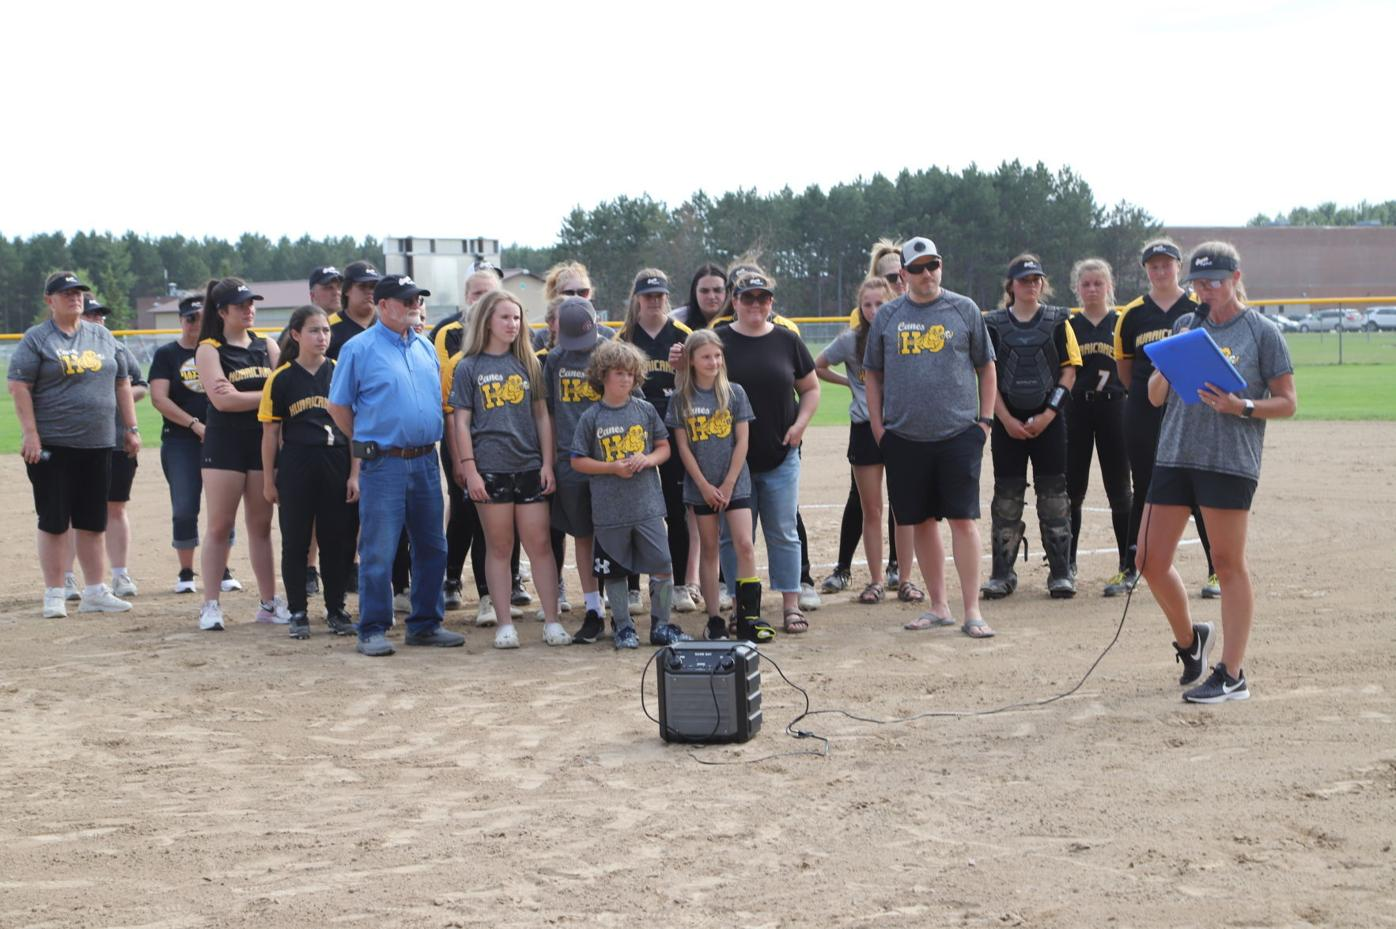 Softball field dedication